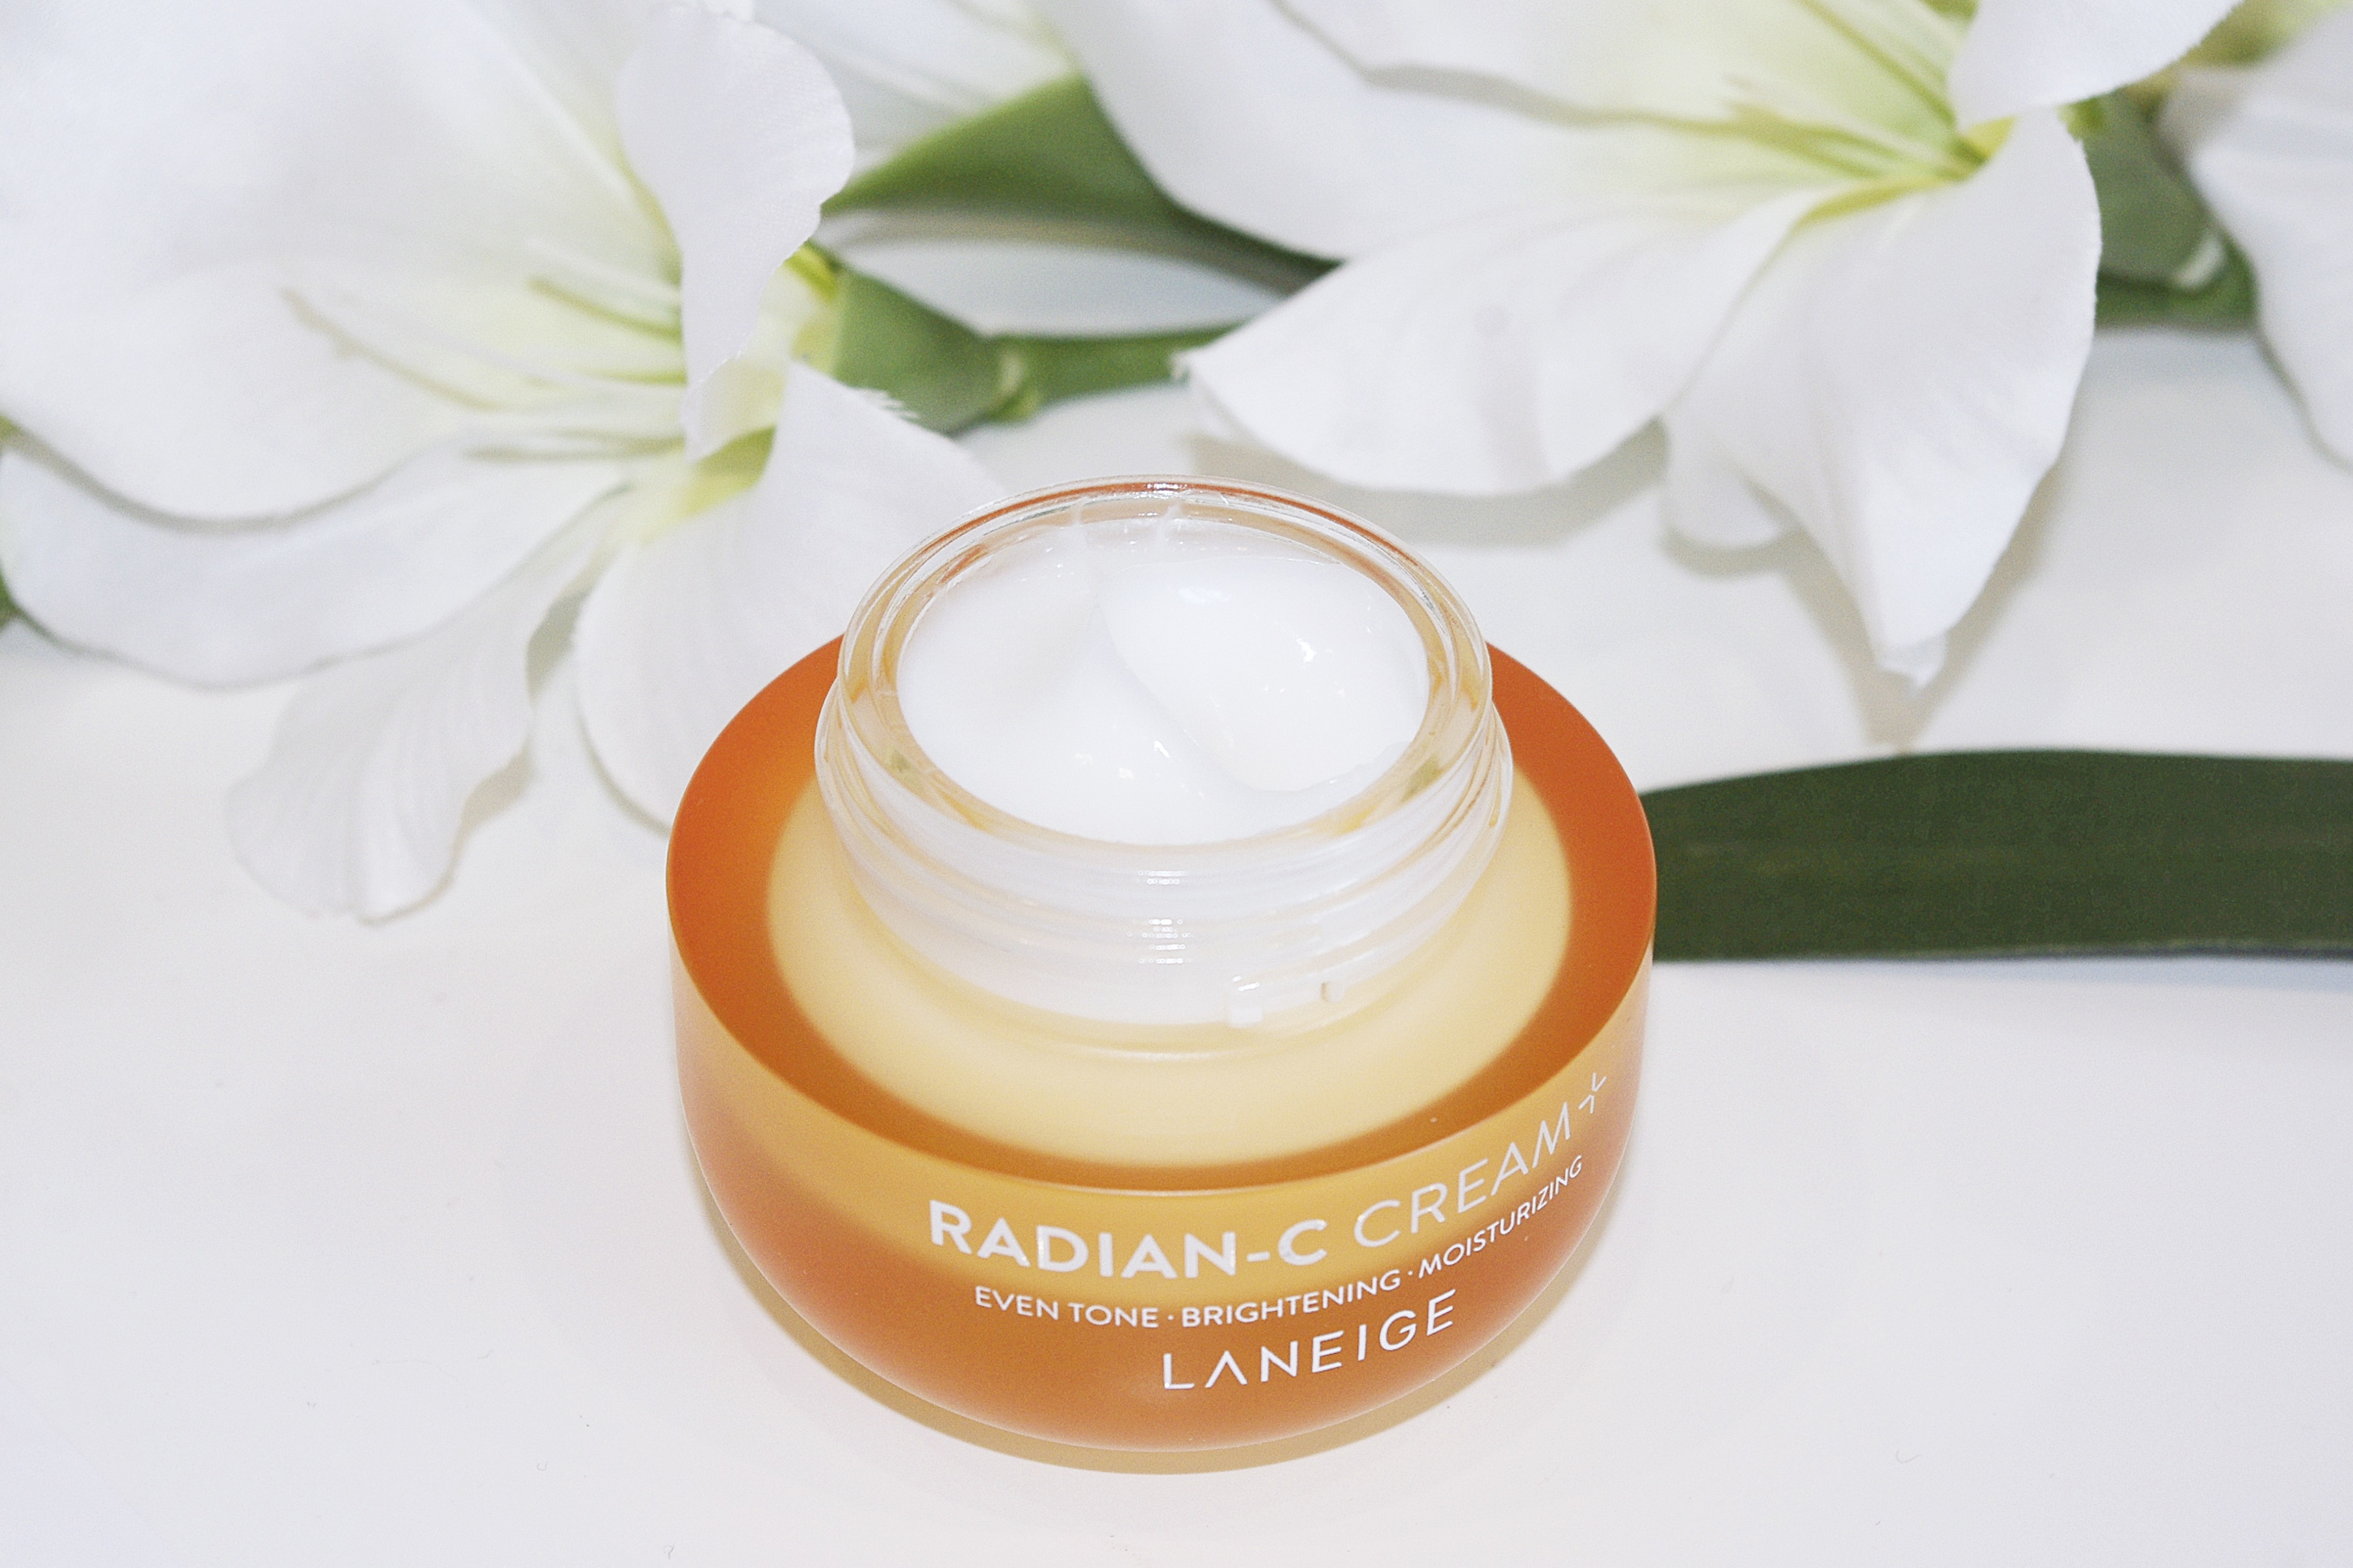 Laneige Radian-C Cream+